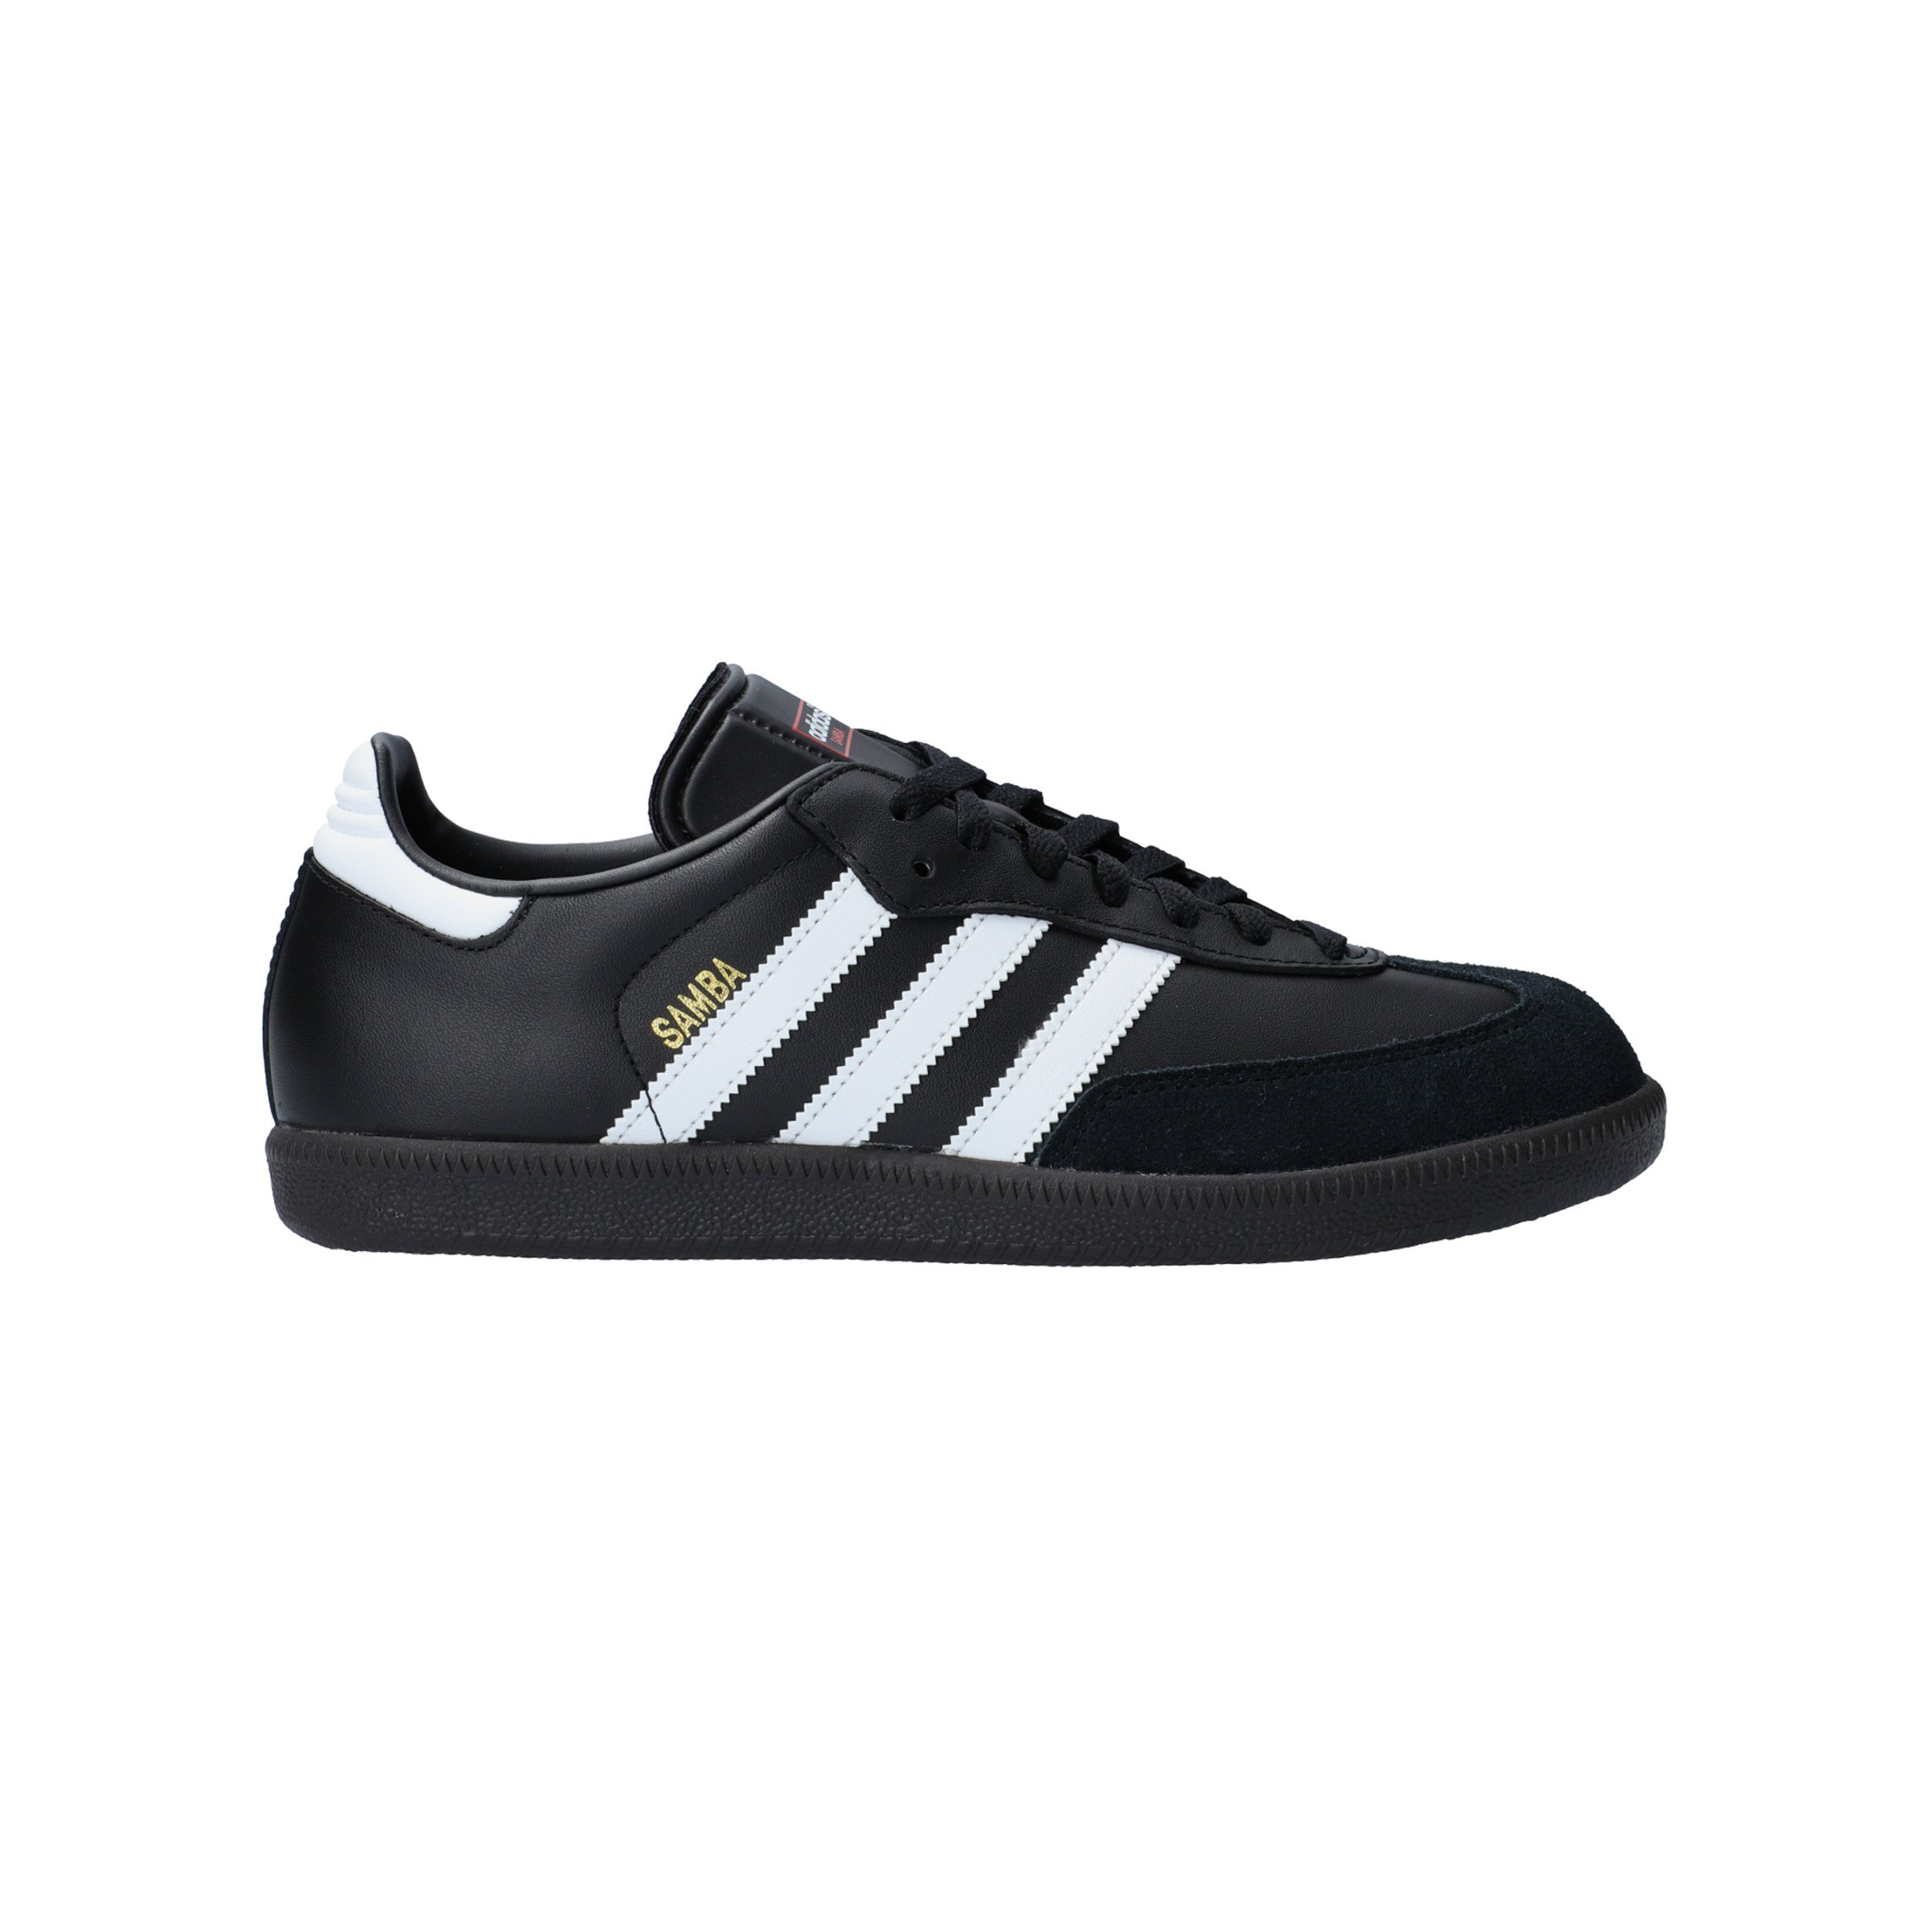 adidas Sneaker Samba 019000 Sportschuhe Fußballschuhe Freizeitschuhe Schuhe